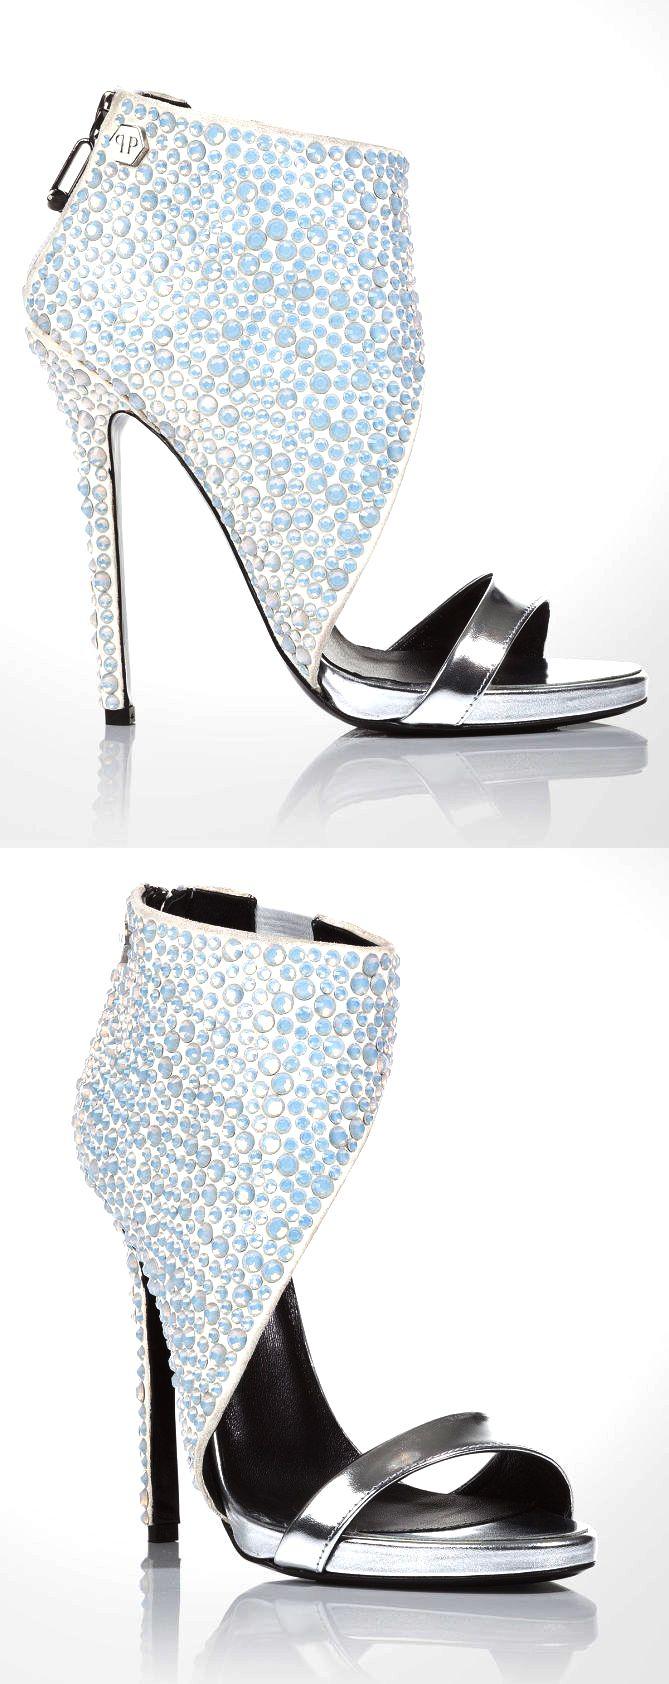 "Philipp Plein ~ ""Futura"" Sandals with glittering rhinestones 2015"